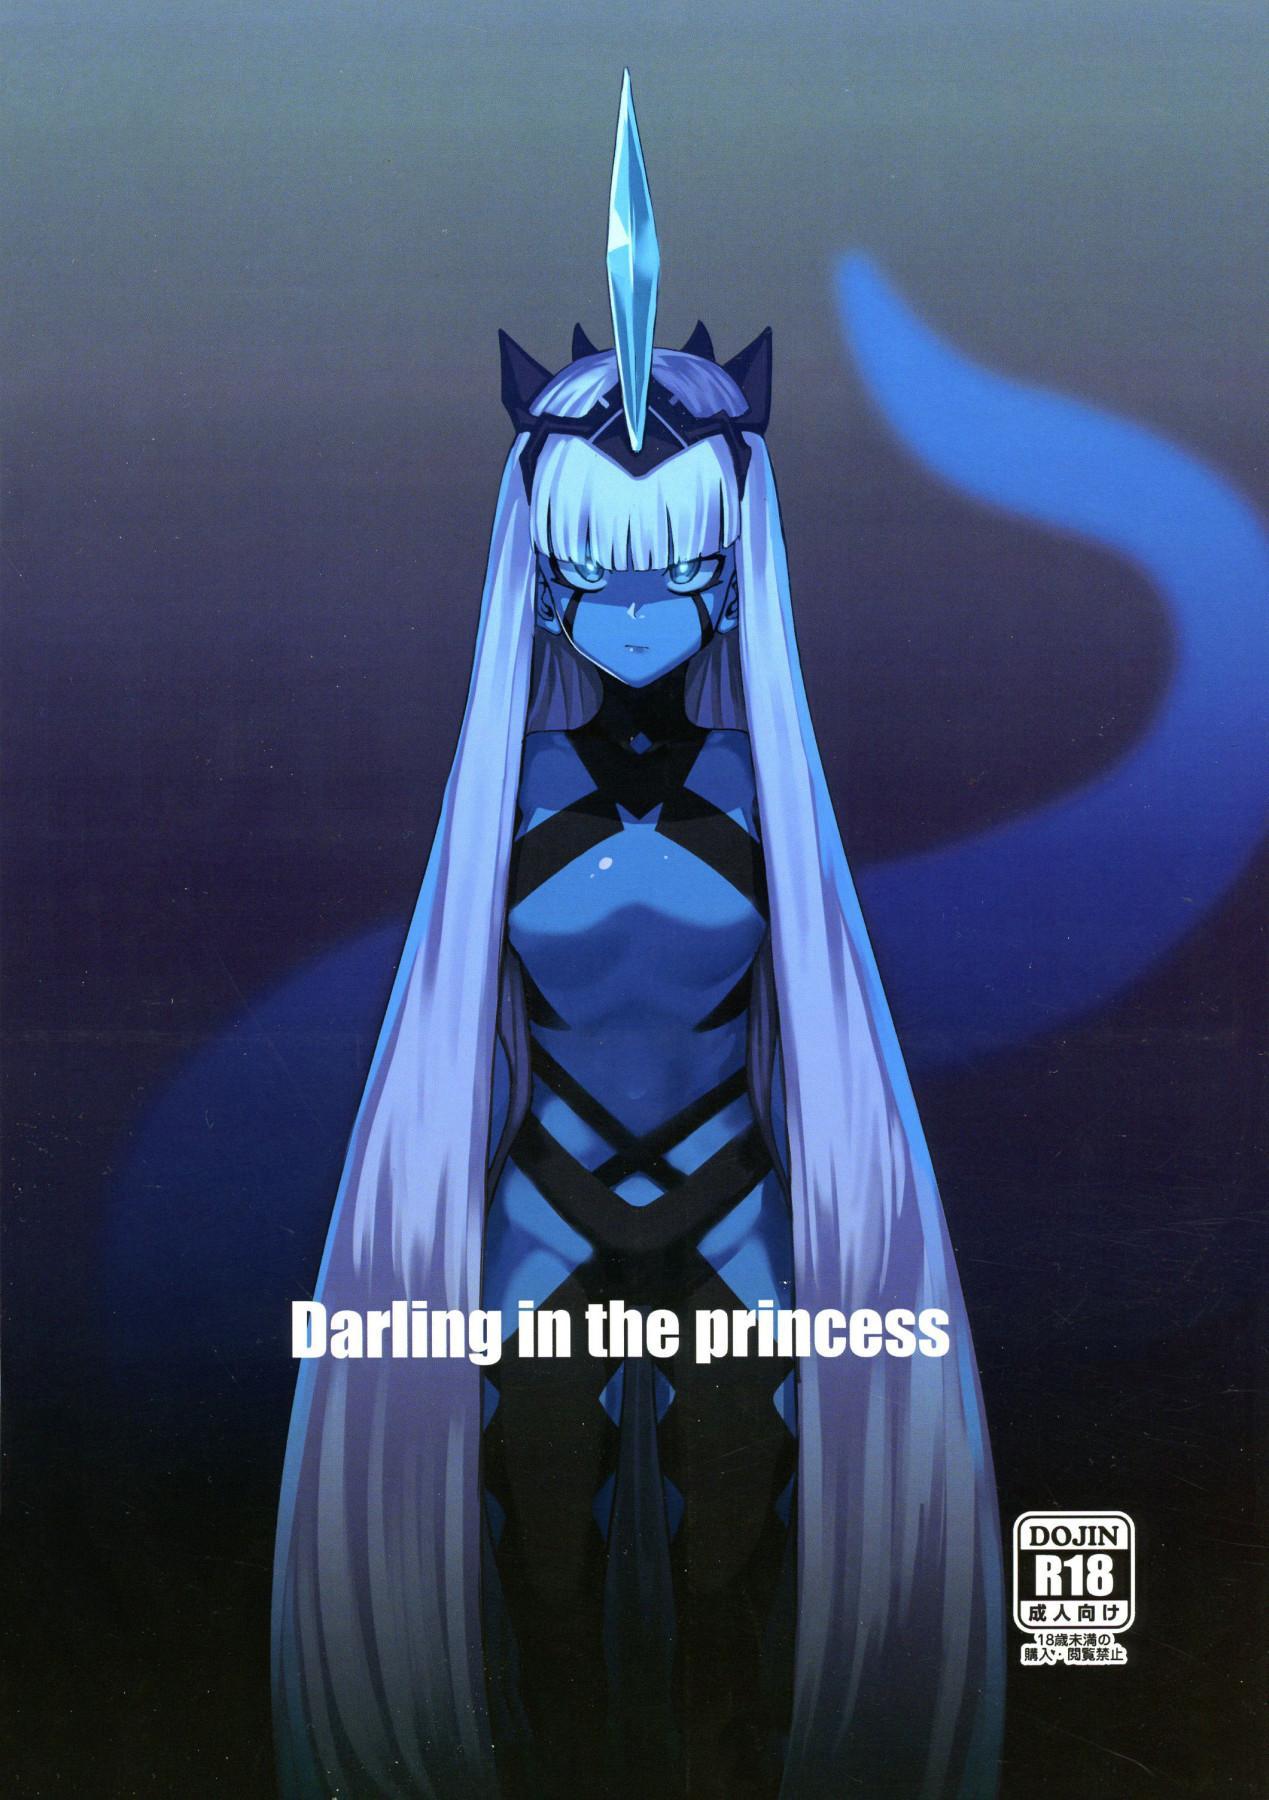 Darling in the princess 0